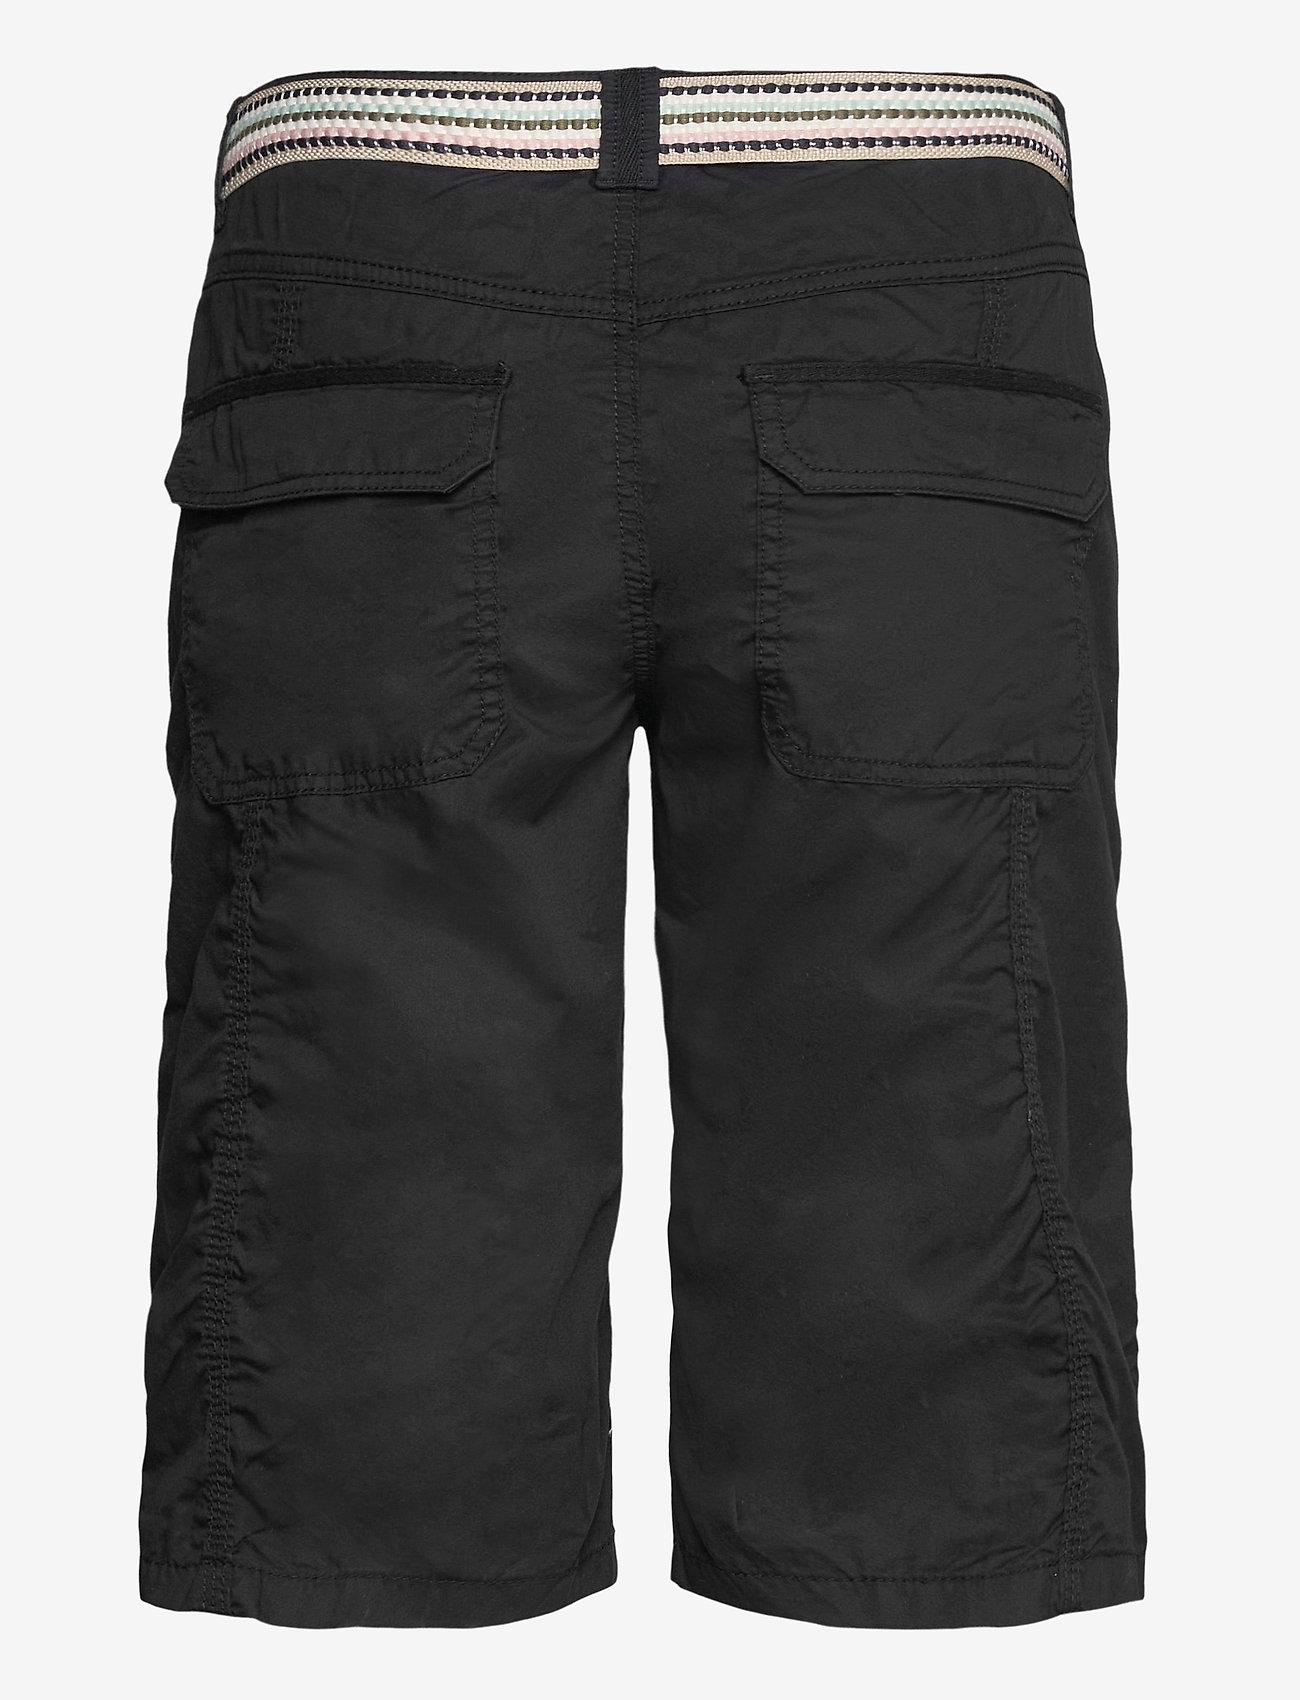 Esprit Casual - Shorts woven - bermudas - black - 1